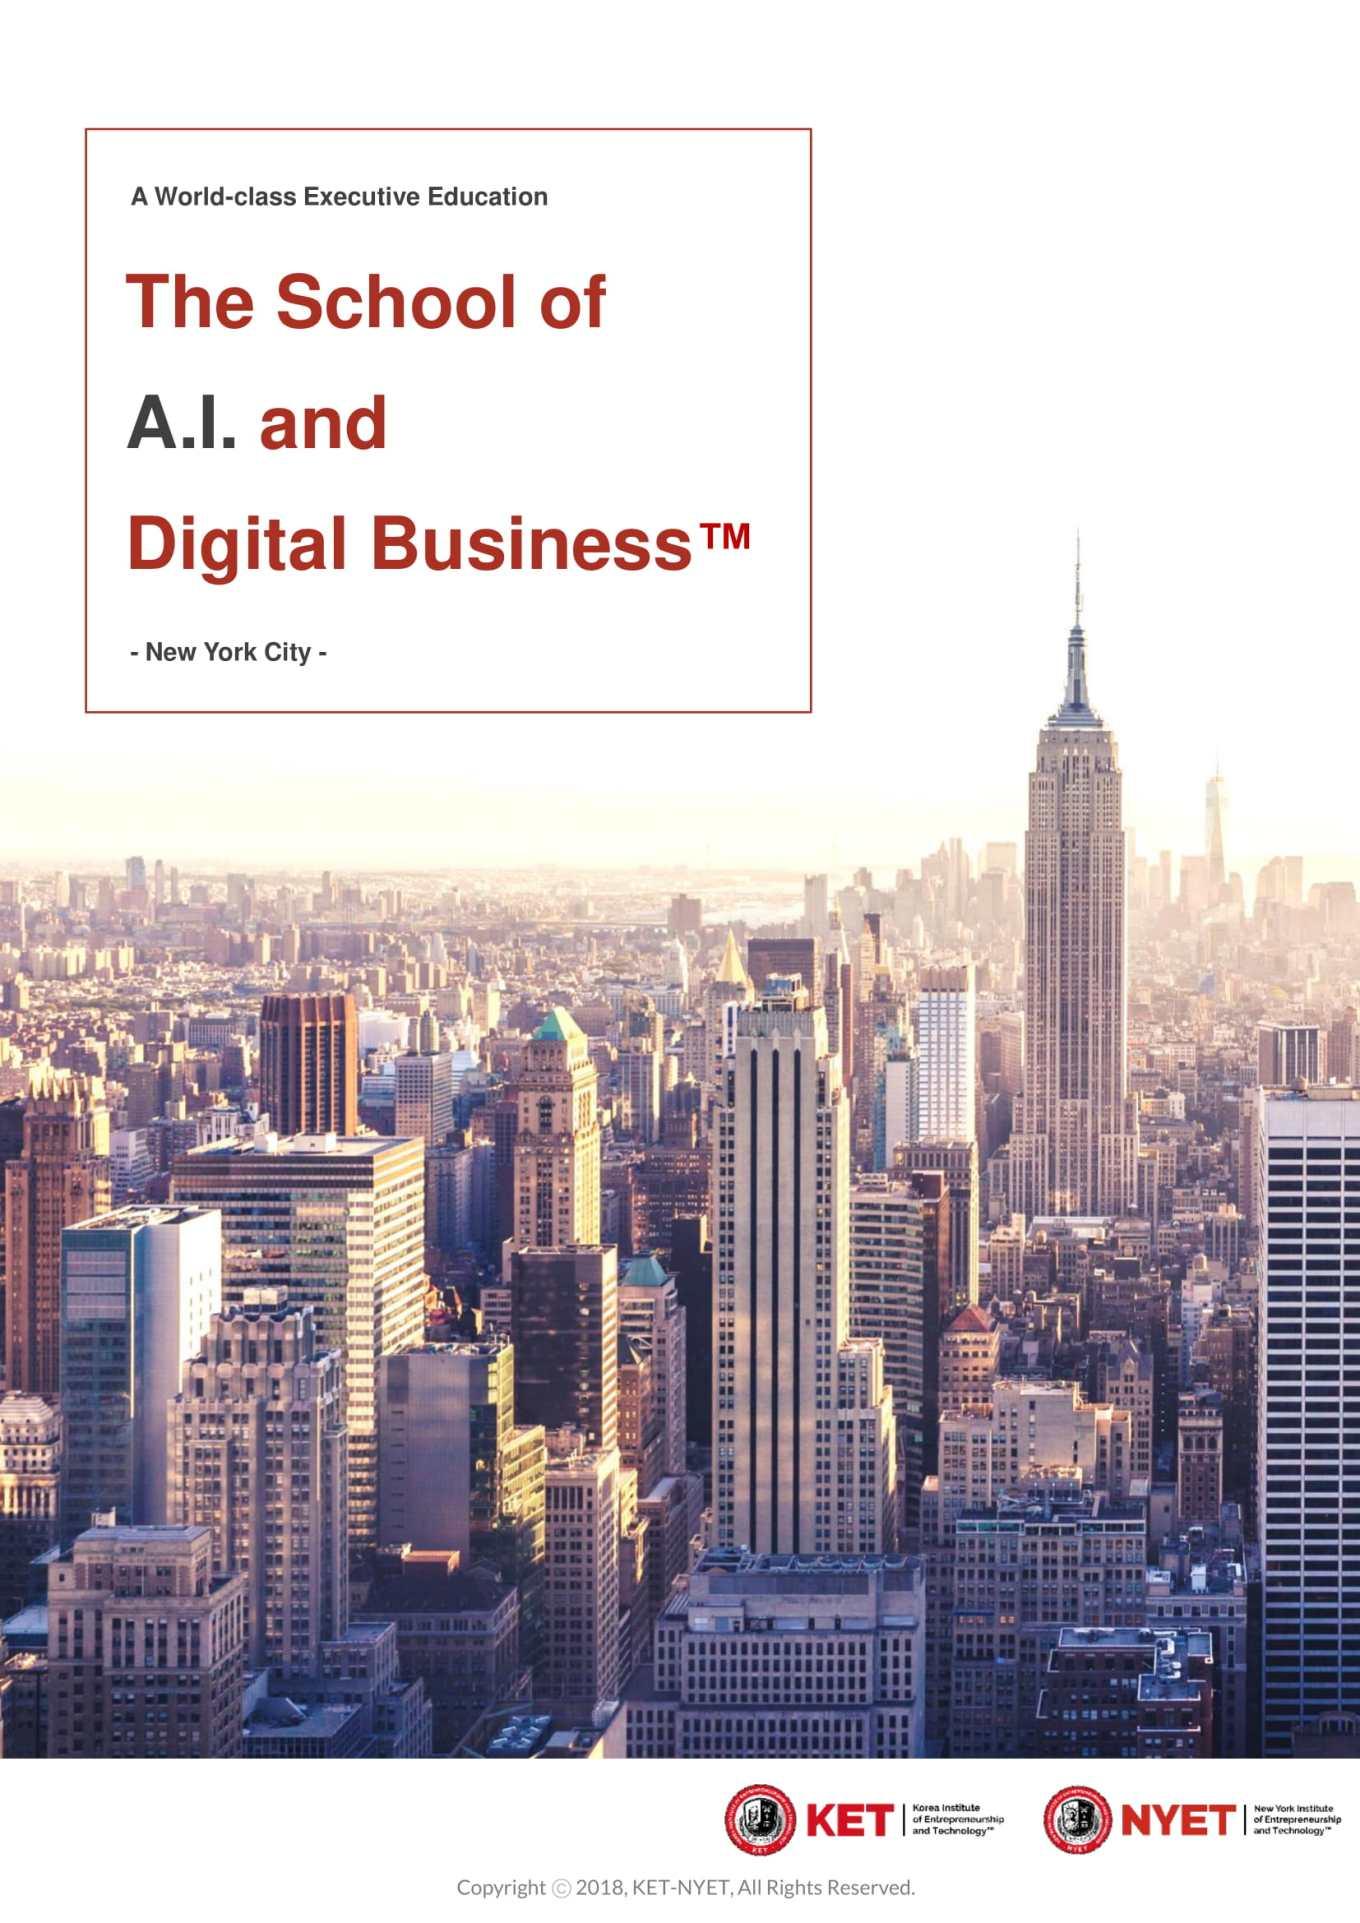 1-1_AI and Digital Business_NYC _English-01